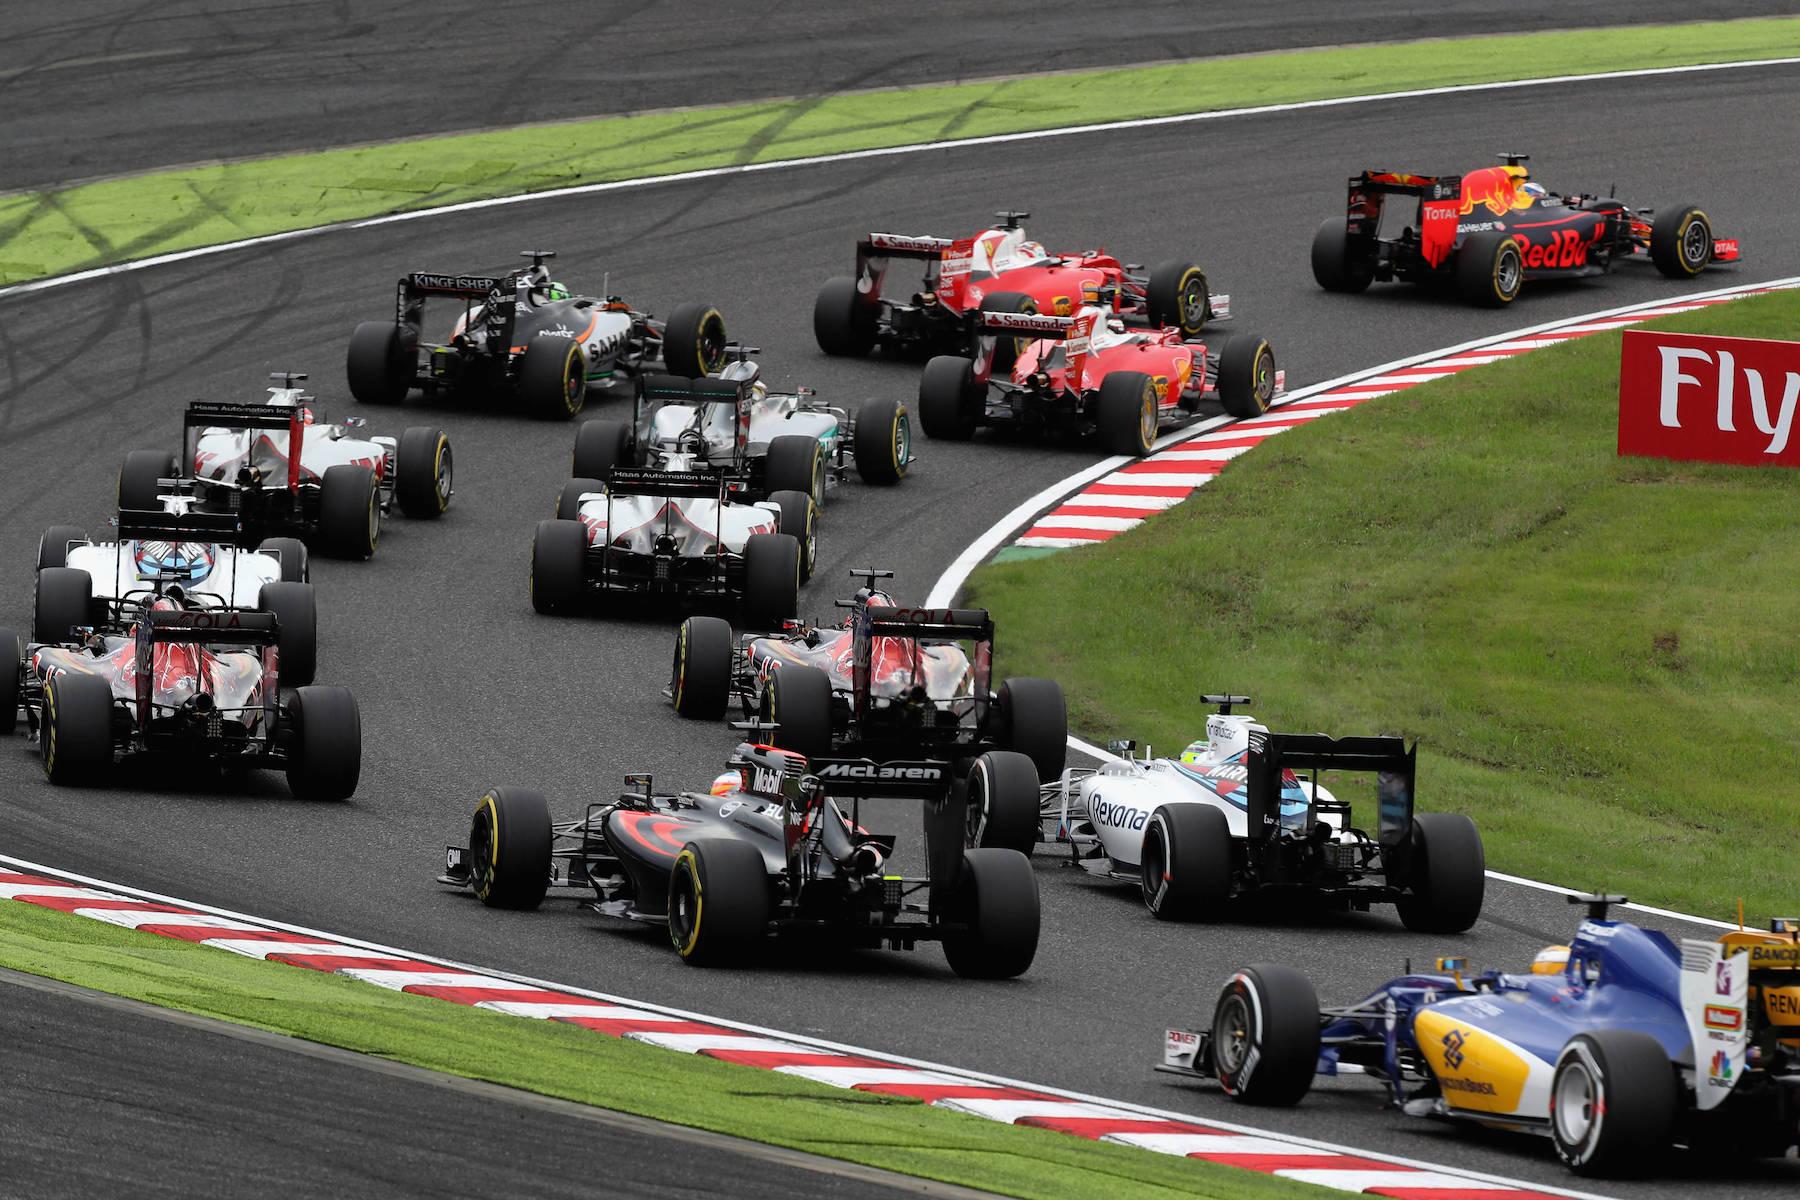 Salracing - 2016 Japanese Grand Prix first curve